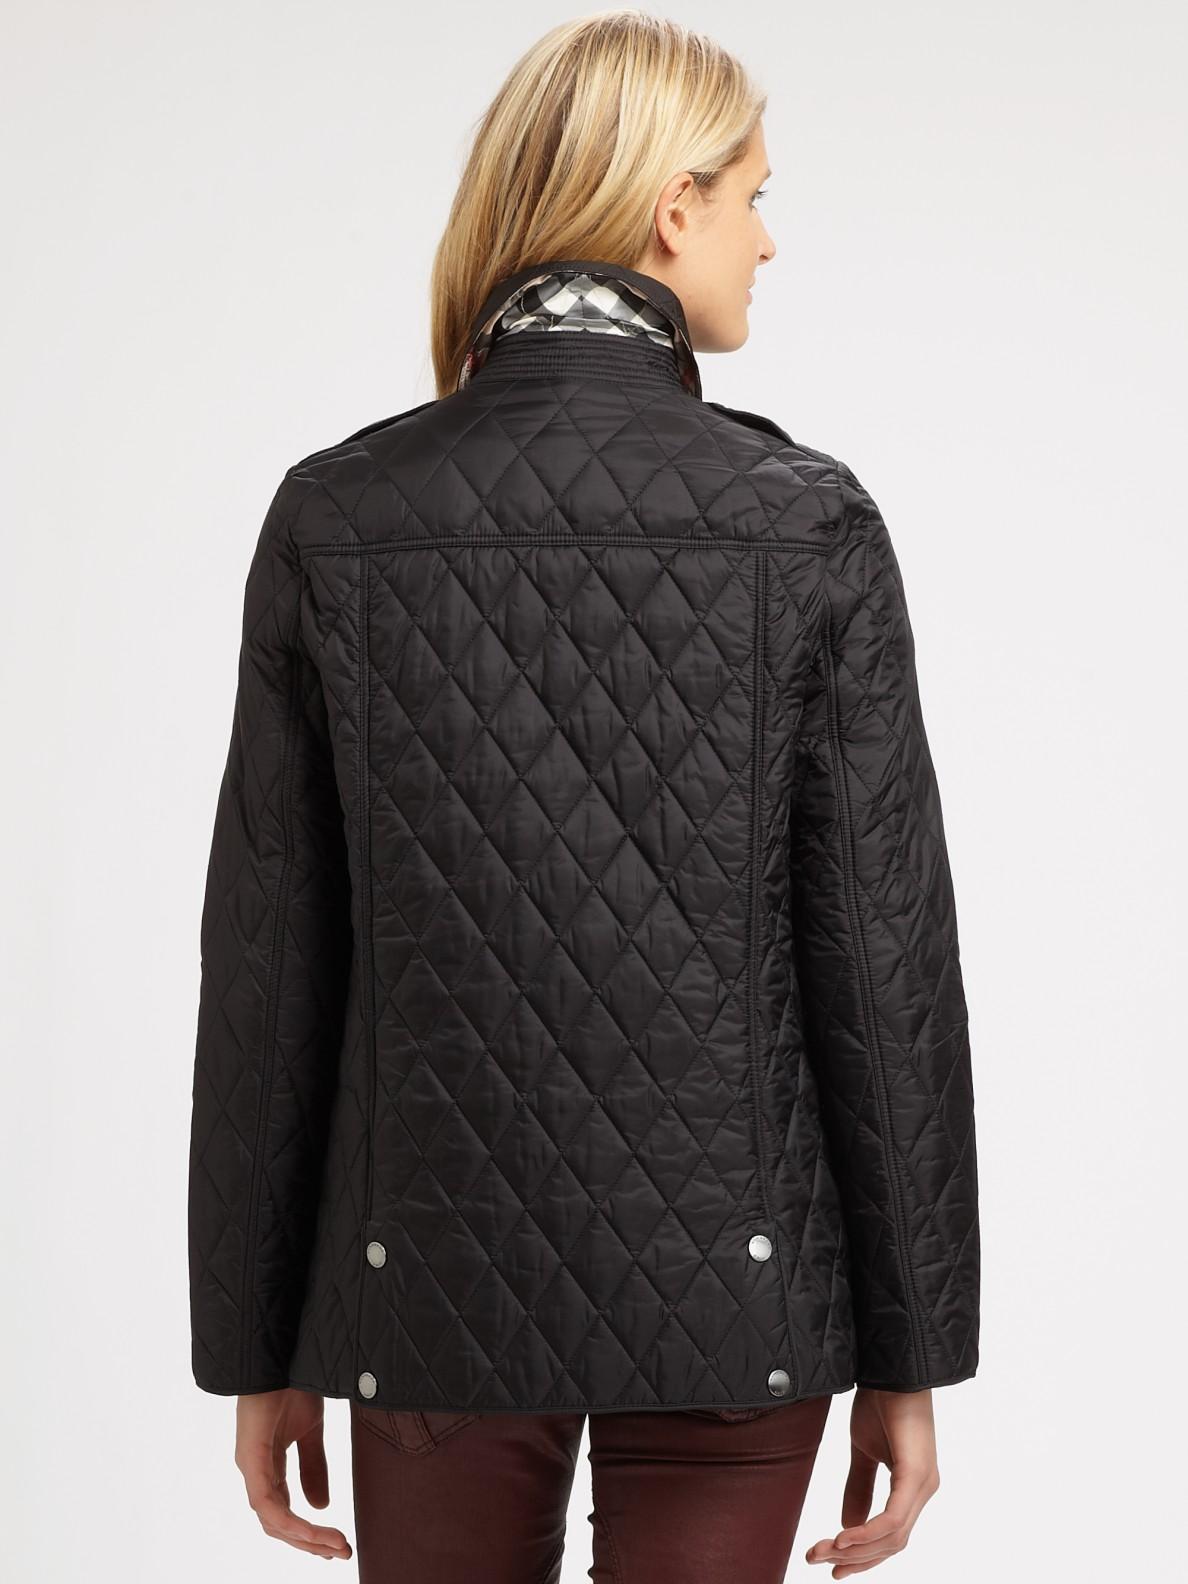 lyst burberry brit pirmont quilted jacket in black. Black Bedroom Furniture Sets. Home Design Ideas